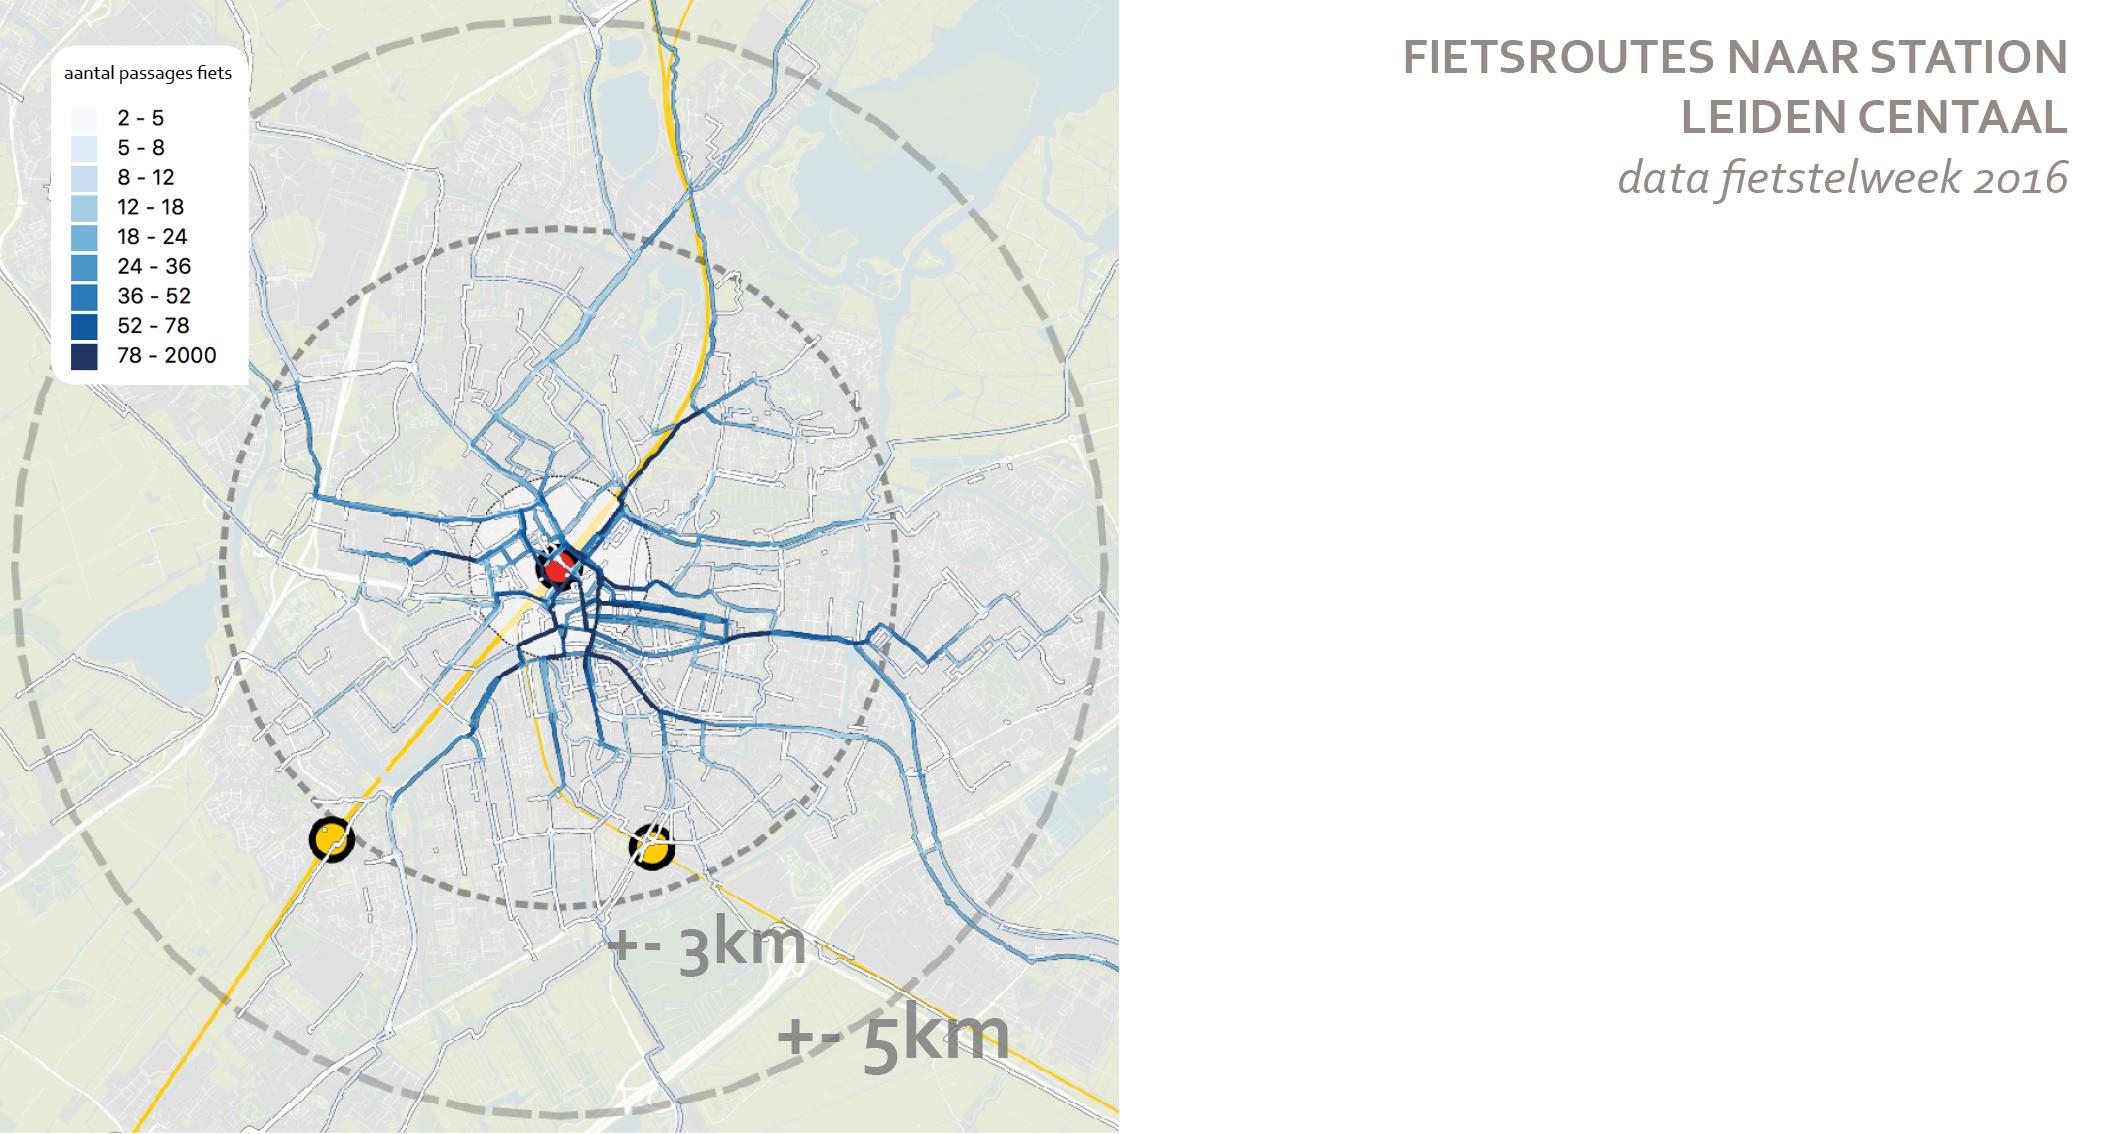 fietsroutes naar stations leiden centraal fietsdata